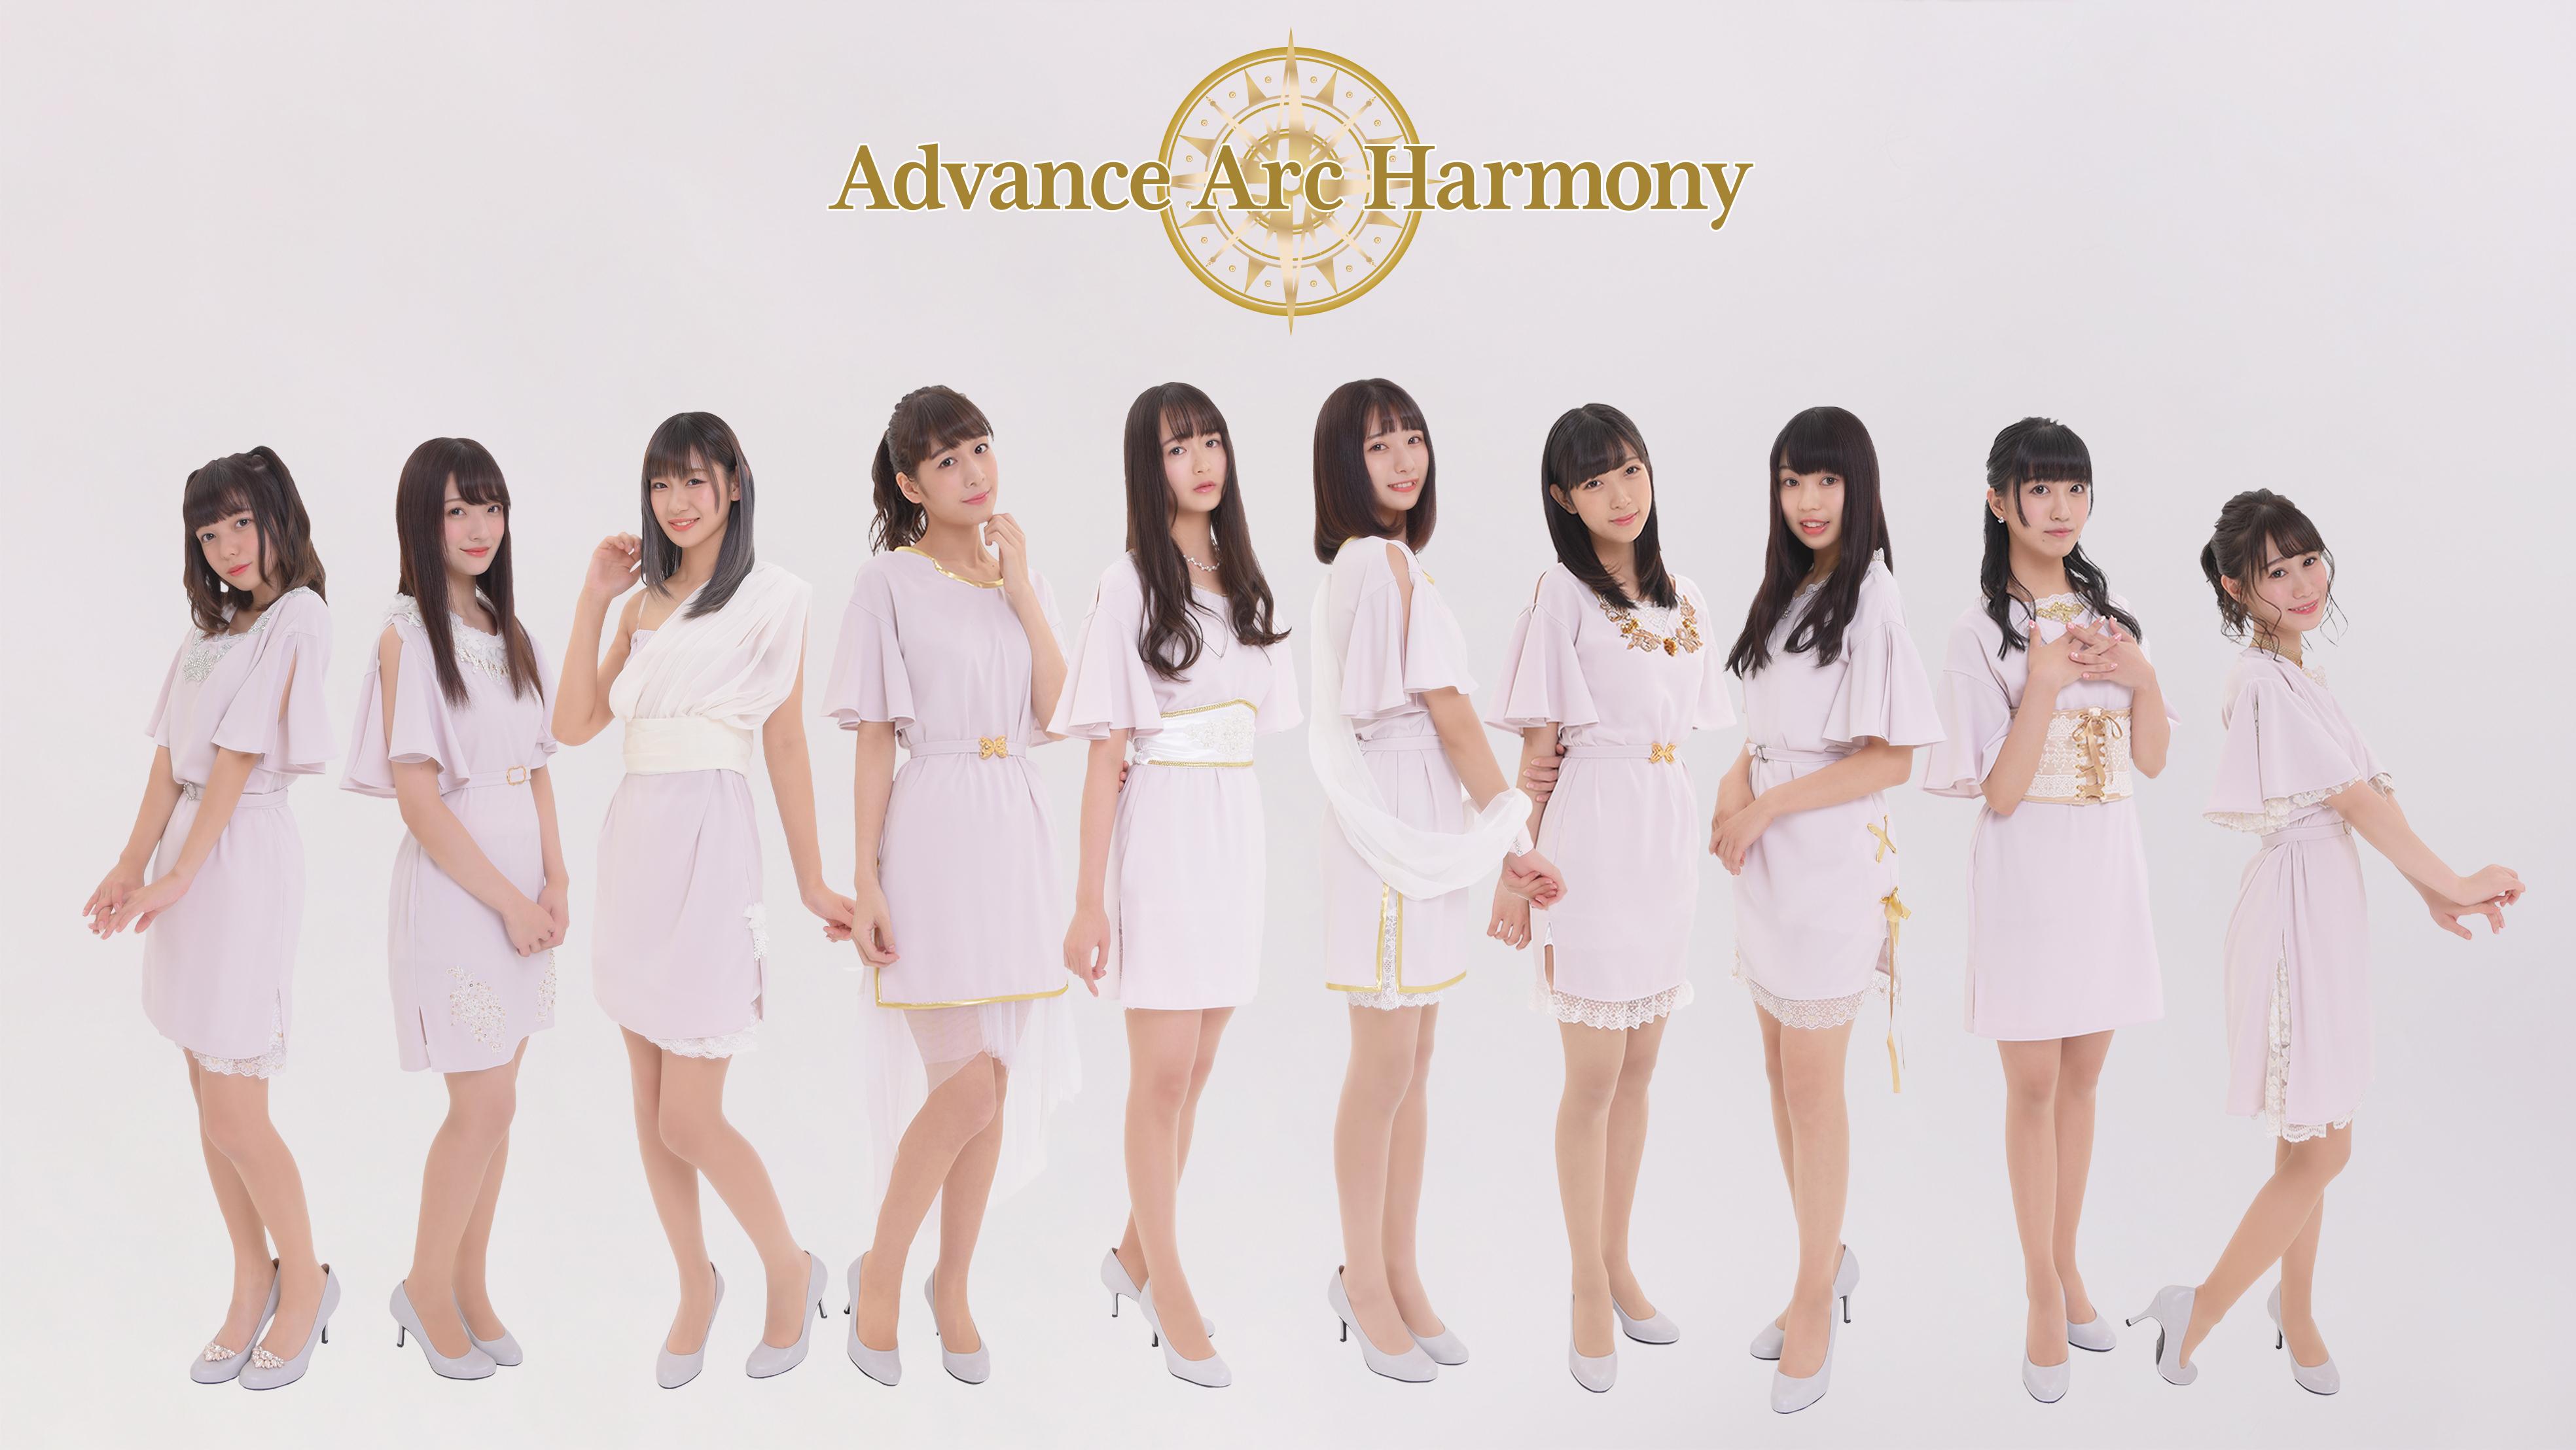 【Advance Arc Harmony】メジャーデビュー決定記念、プロモーションキャンペーン&アドモニ総選挙始動!?